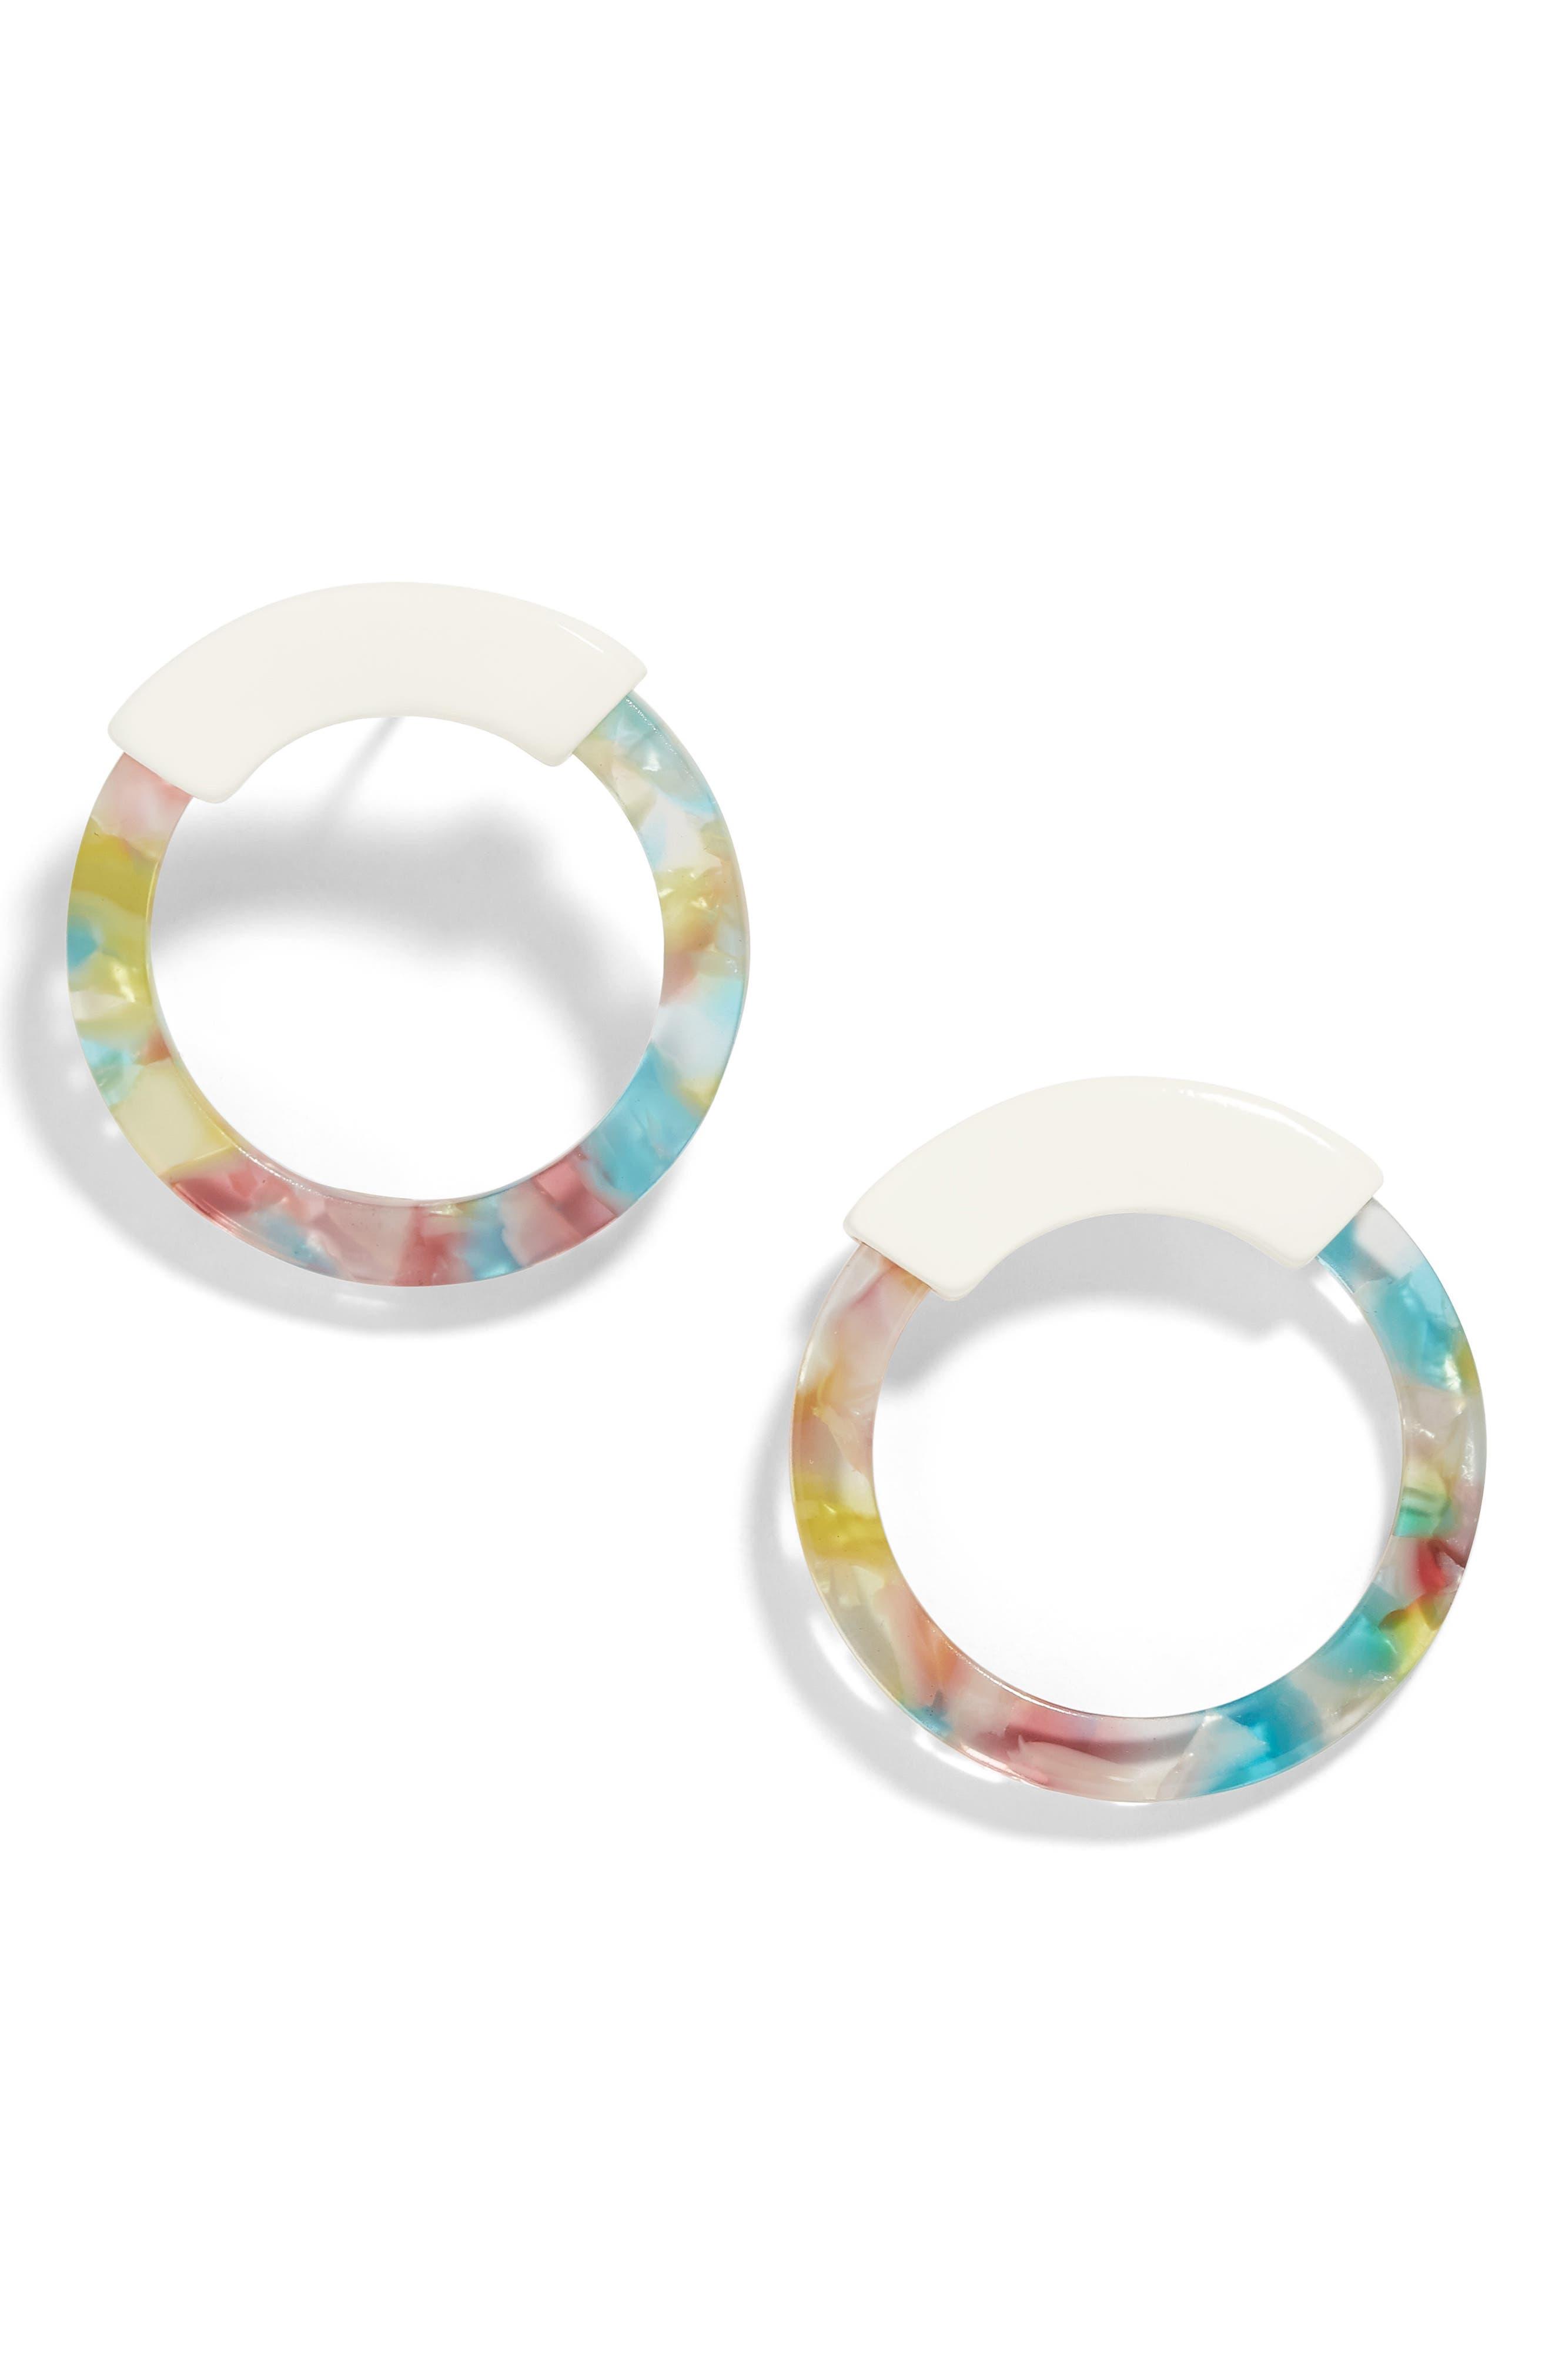 DeAnn Resin Hoop Earrings,                         Main,                         color, MULTI